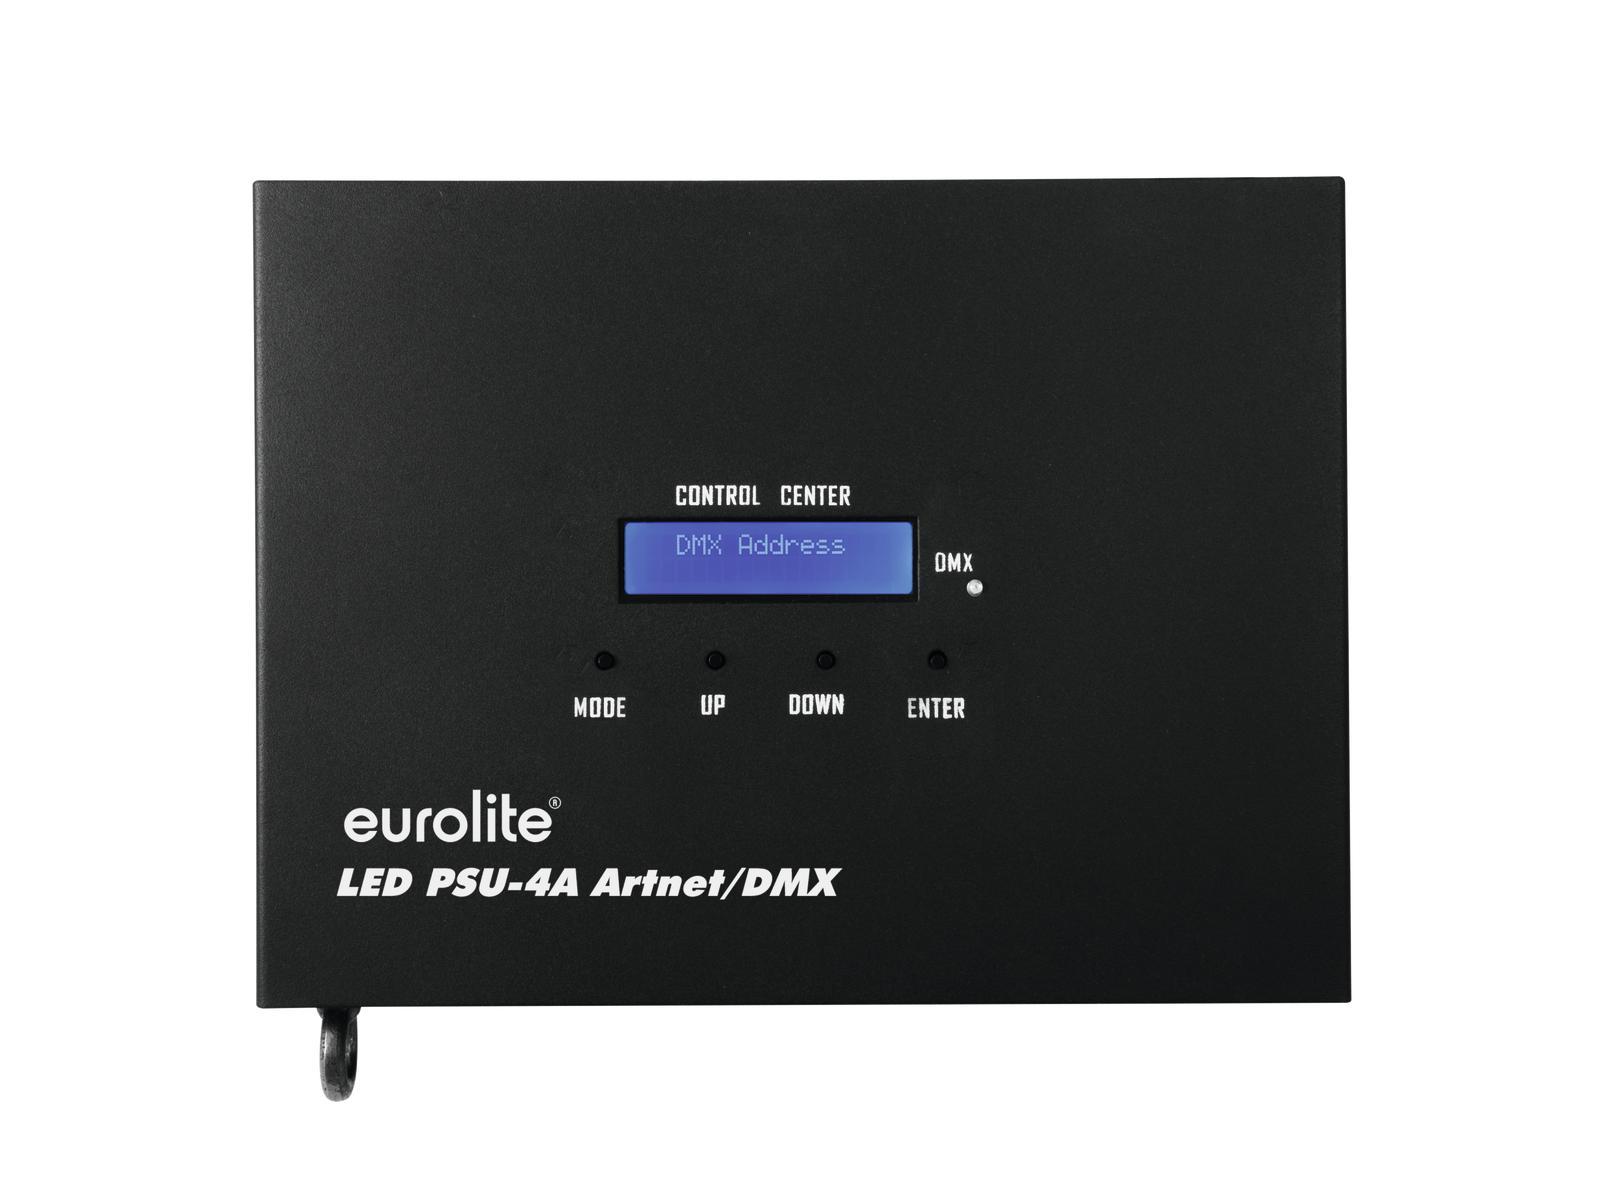 EUROLITE LED PSU-4A Artnet/DMX